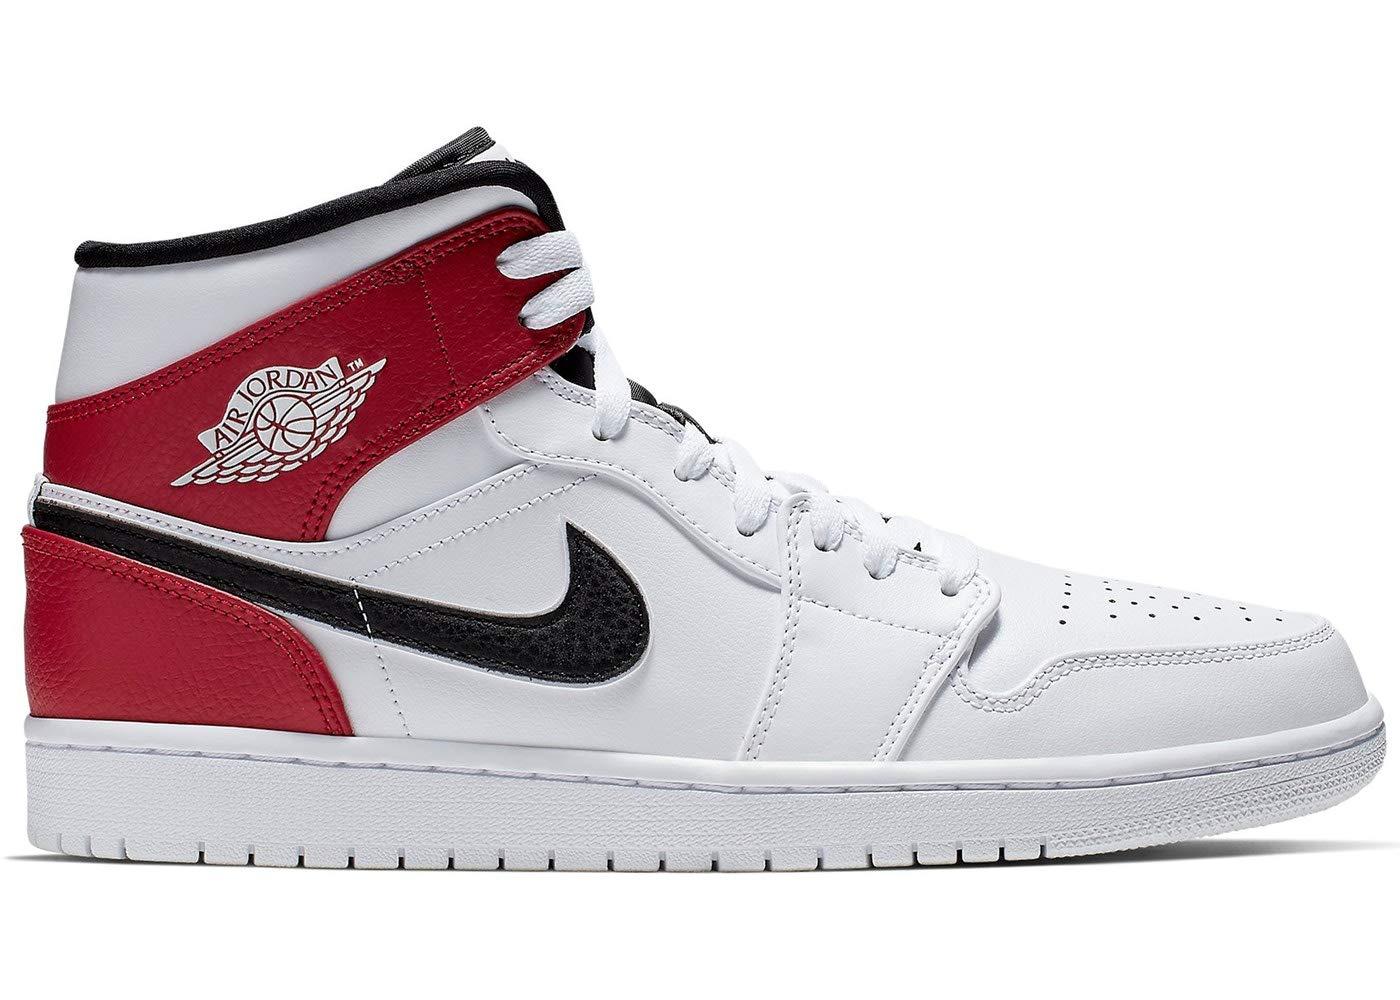 Nike Men's Jordan AJ 1 Mid White/Black/Gym Red Leather Casual Shoes 10 M US by Nike